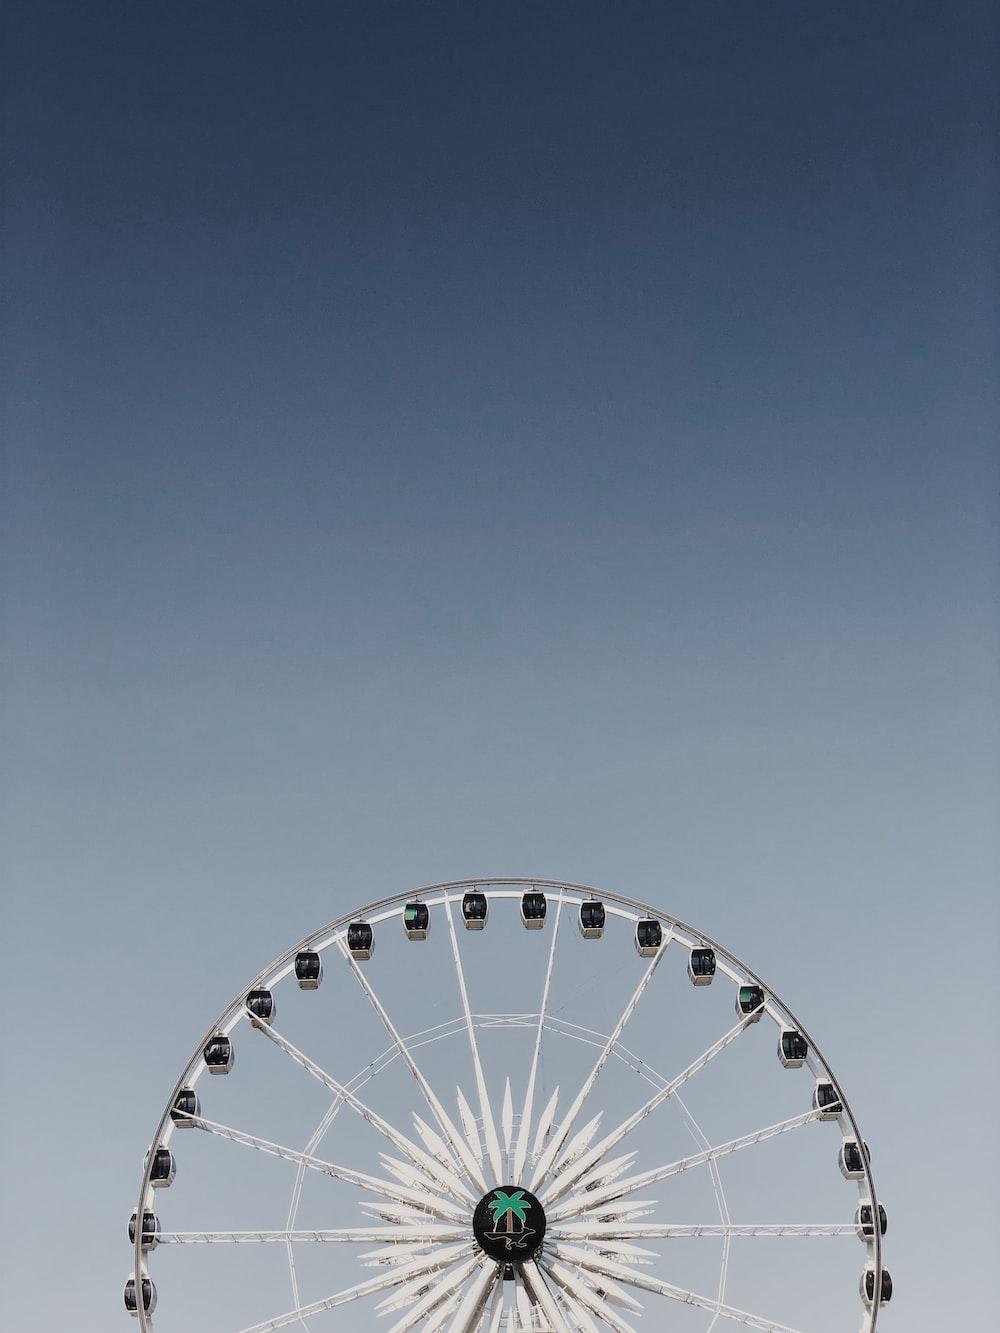 white and black Ferris wheel